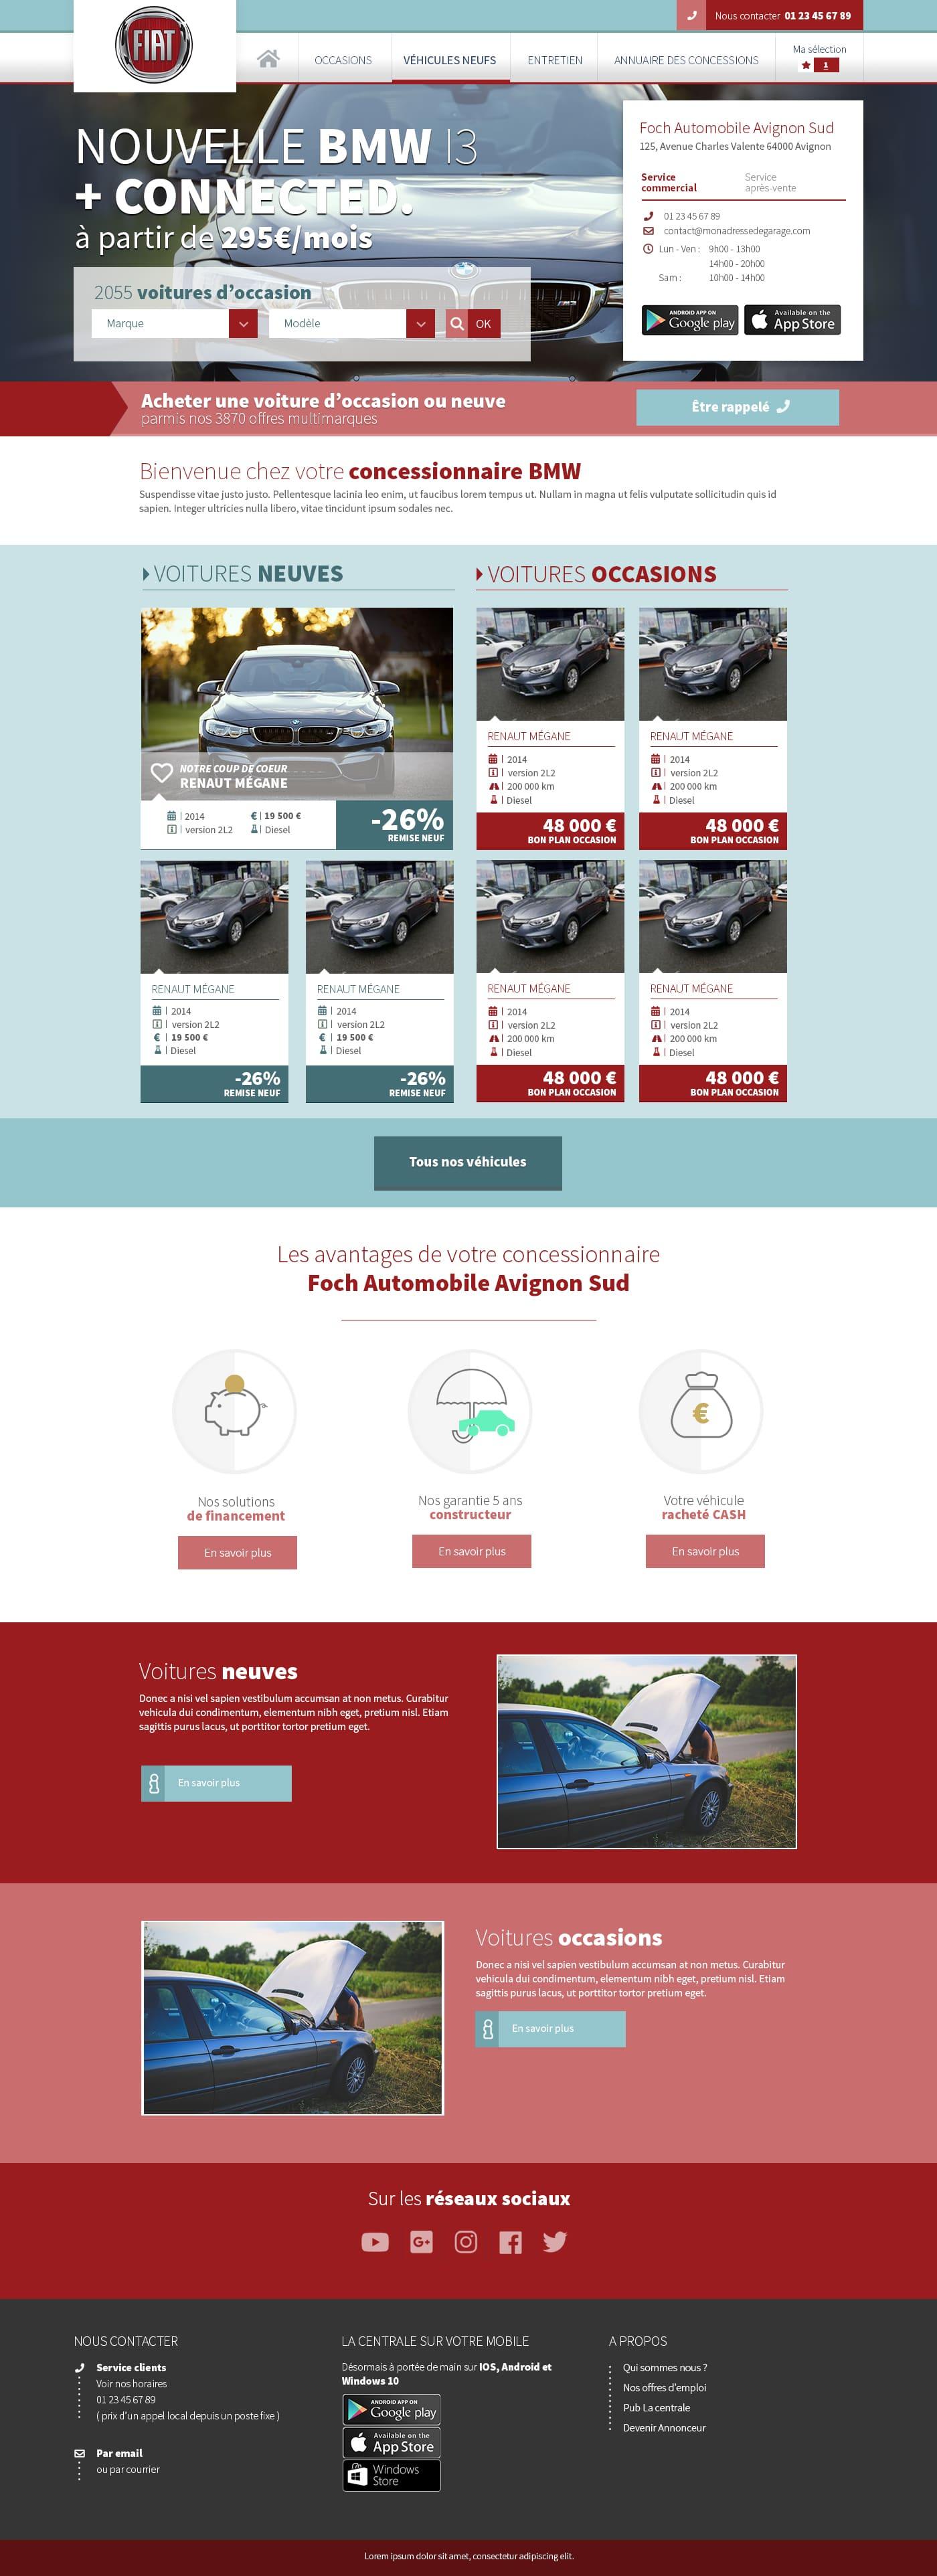 Autocadre - Webdesigner freelance - Page d'accueil